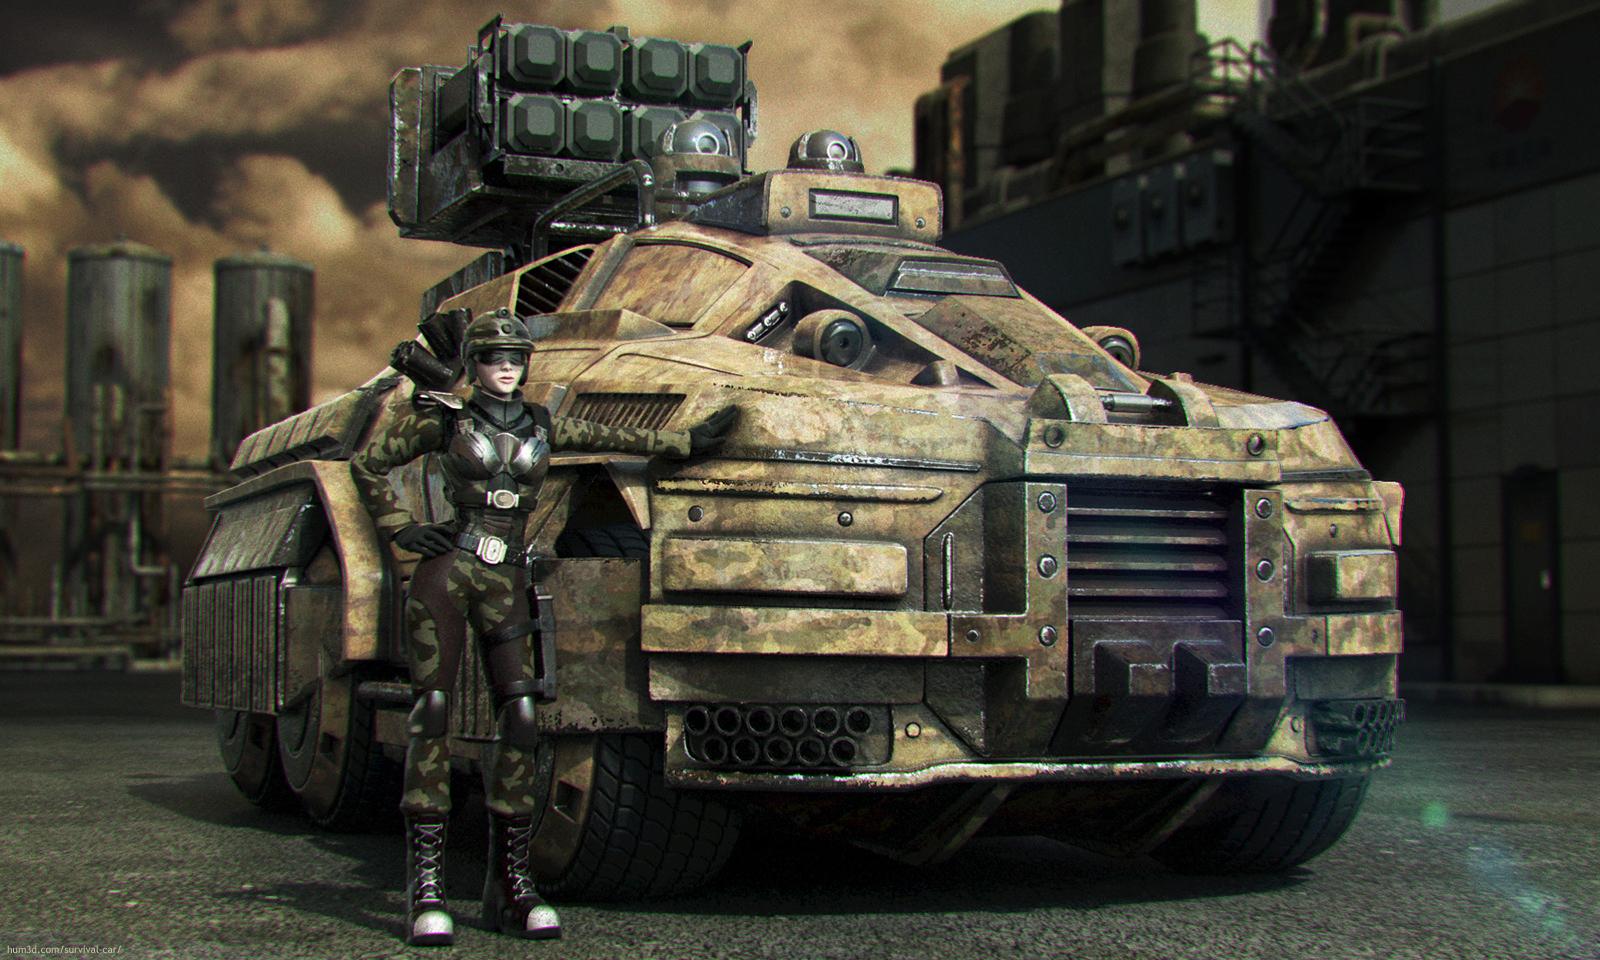 The Rhino. Autonomous Multirole Survival Military Vehicle 3d art